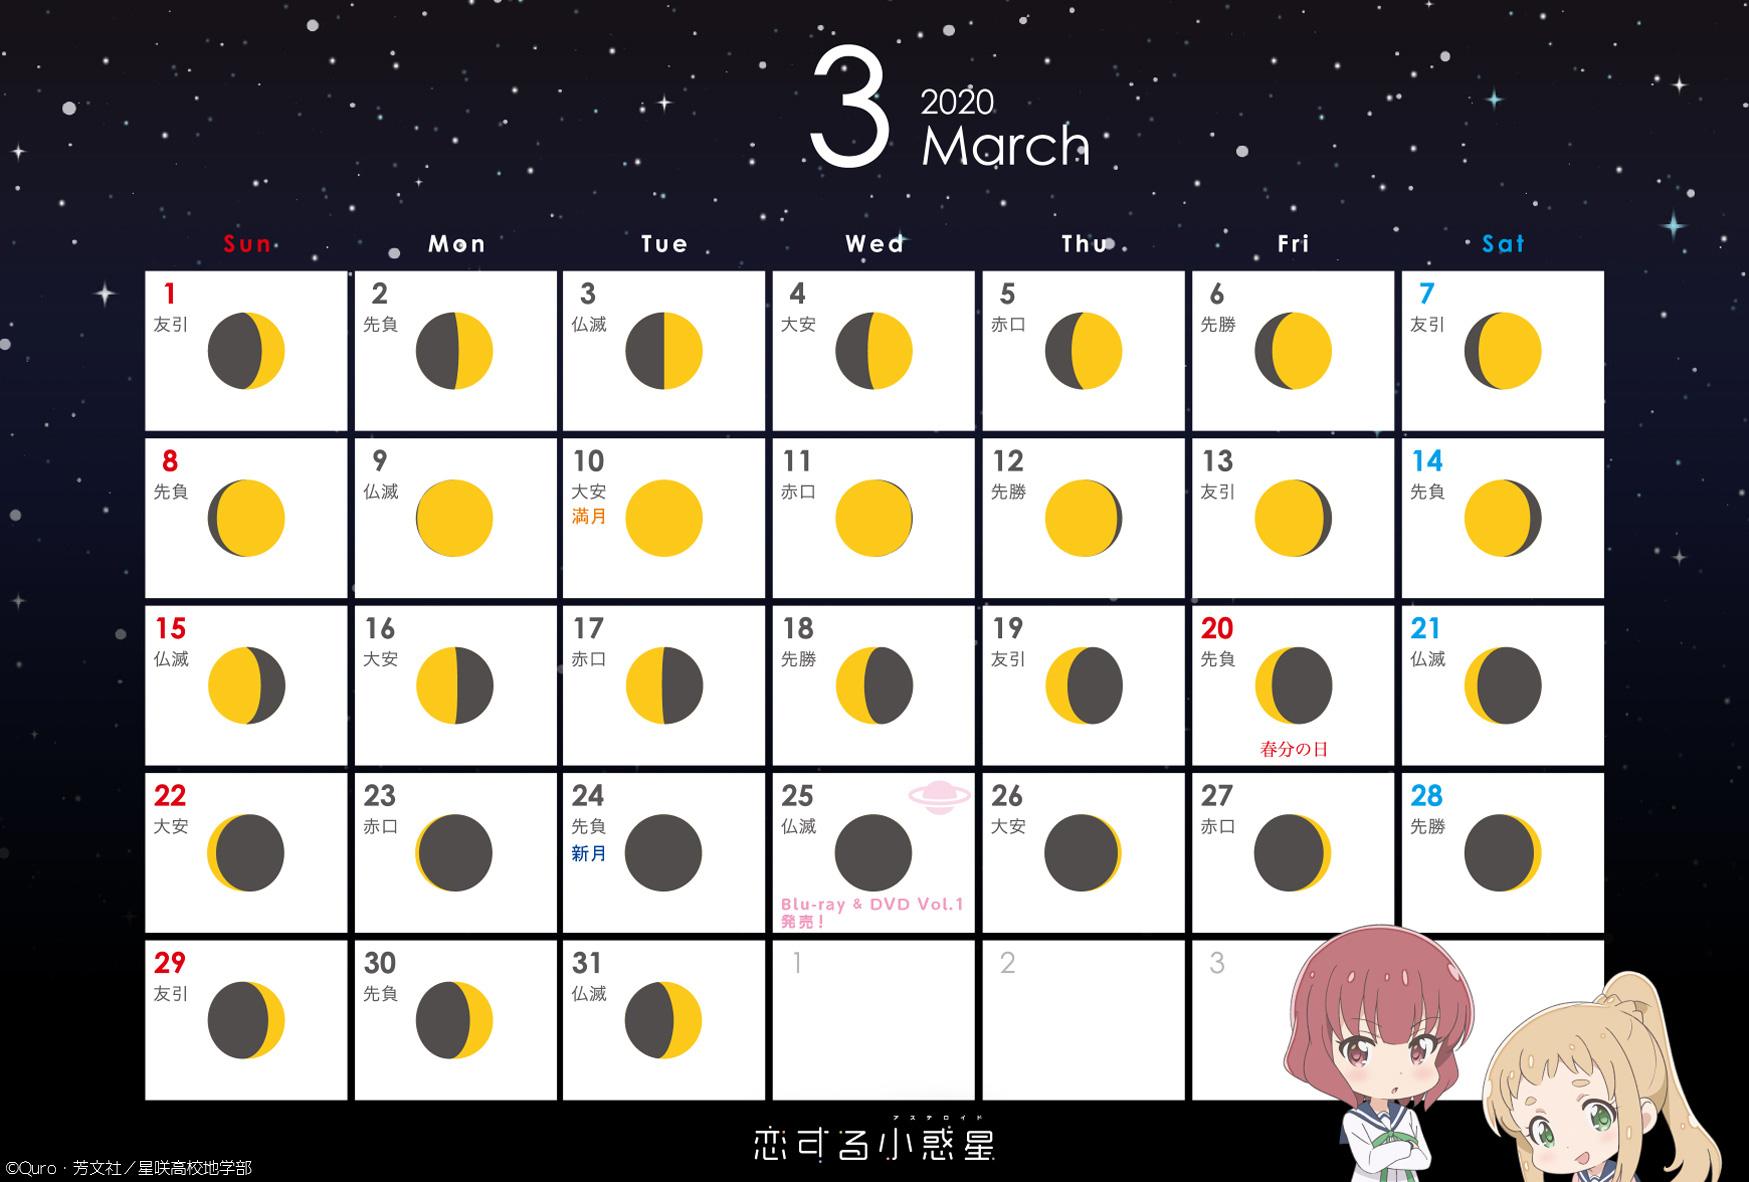 Special Tvアニメ 恋する小惑星 公式サイト